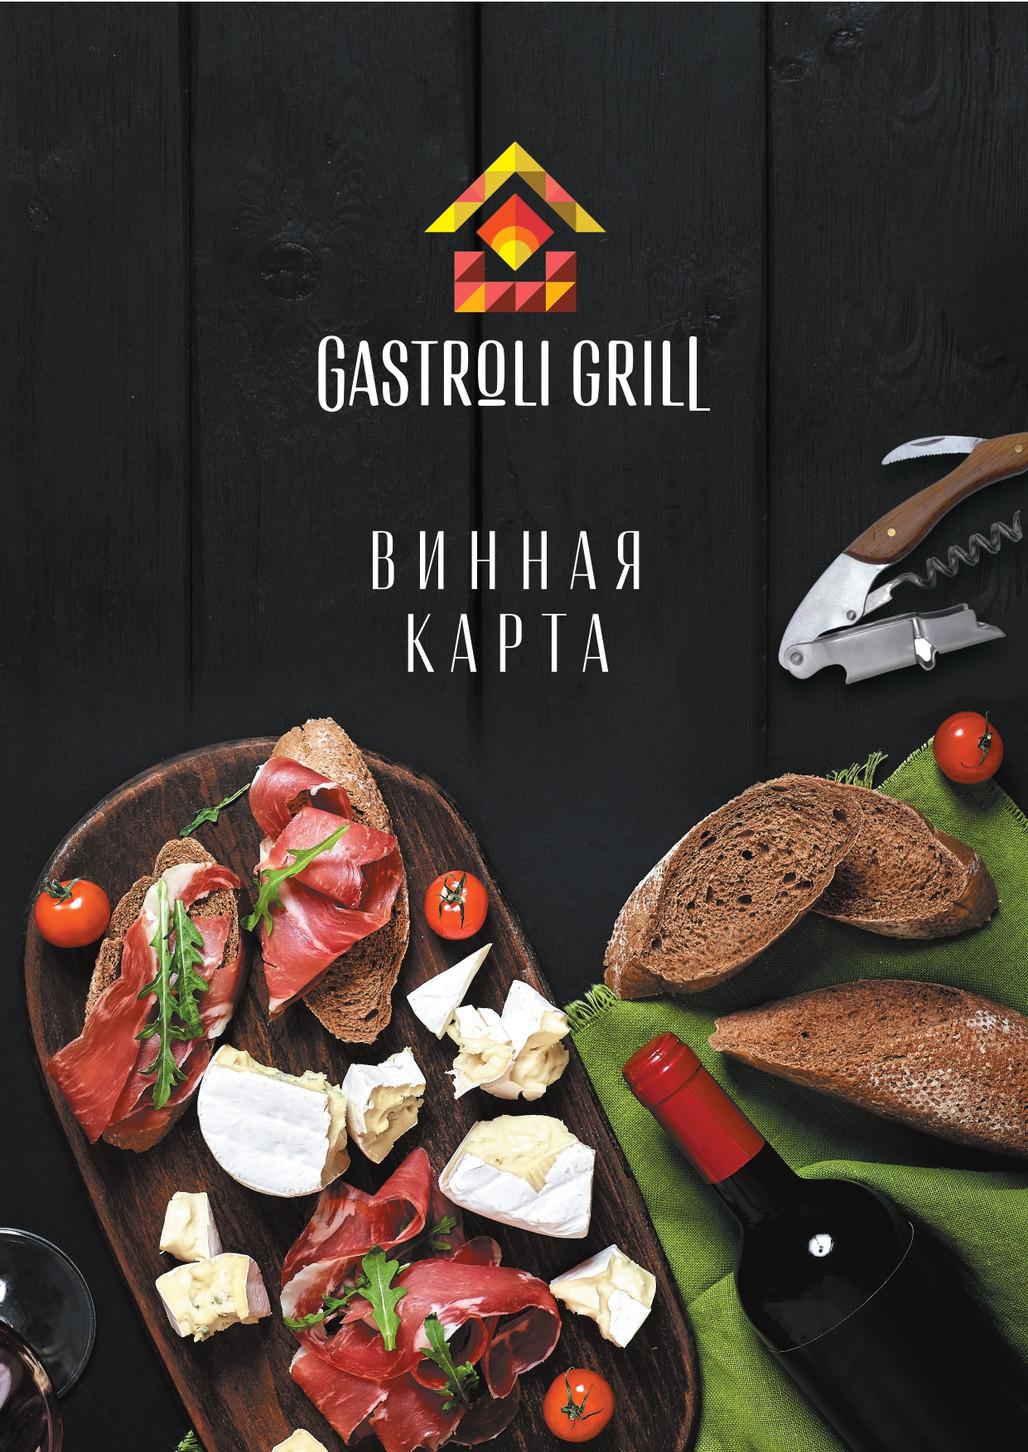 gastroli_wine_menu_print_page-0001.jpg